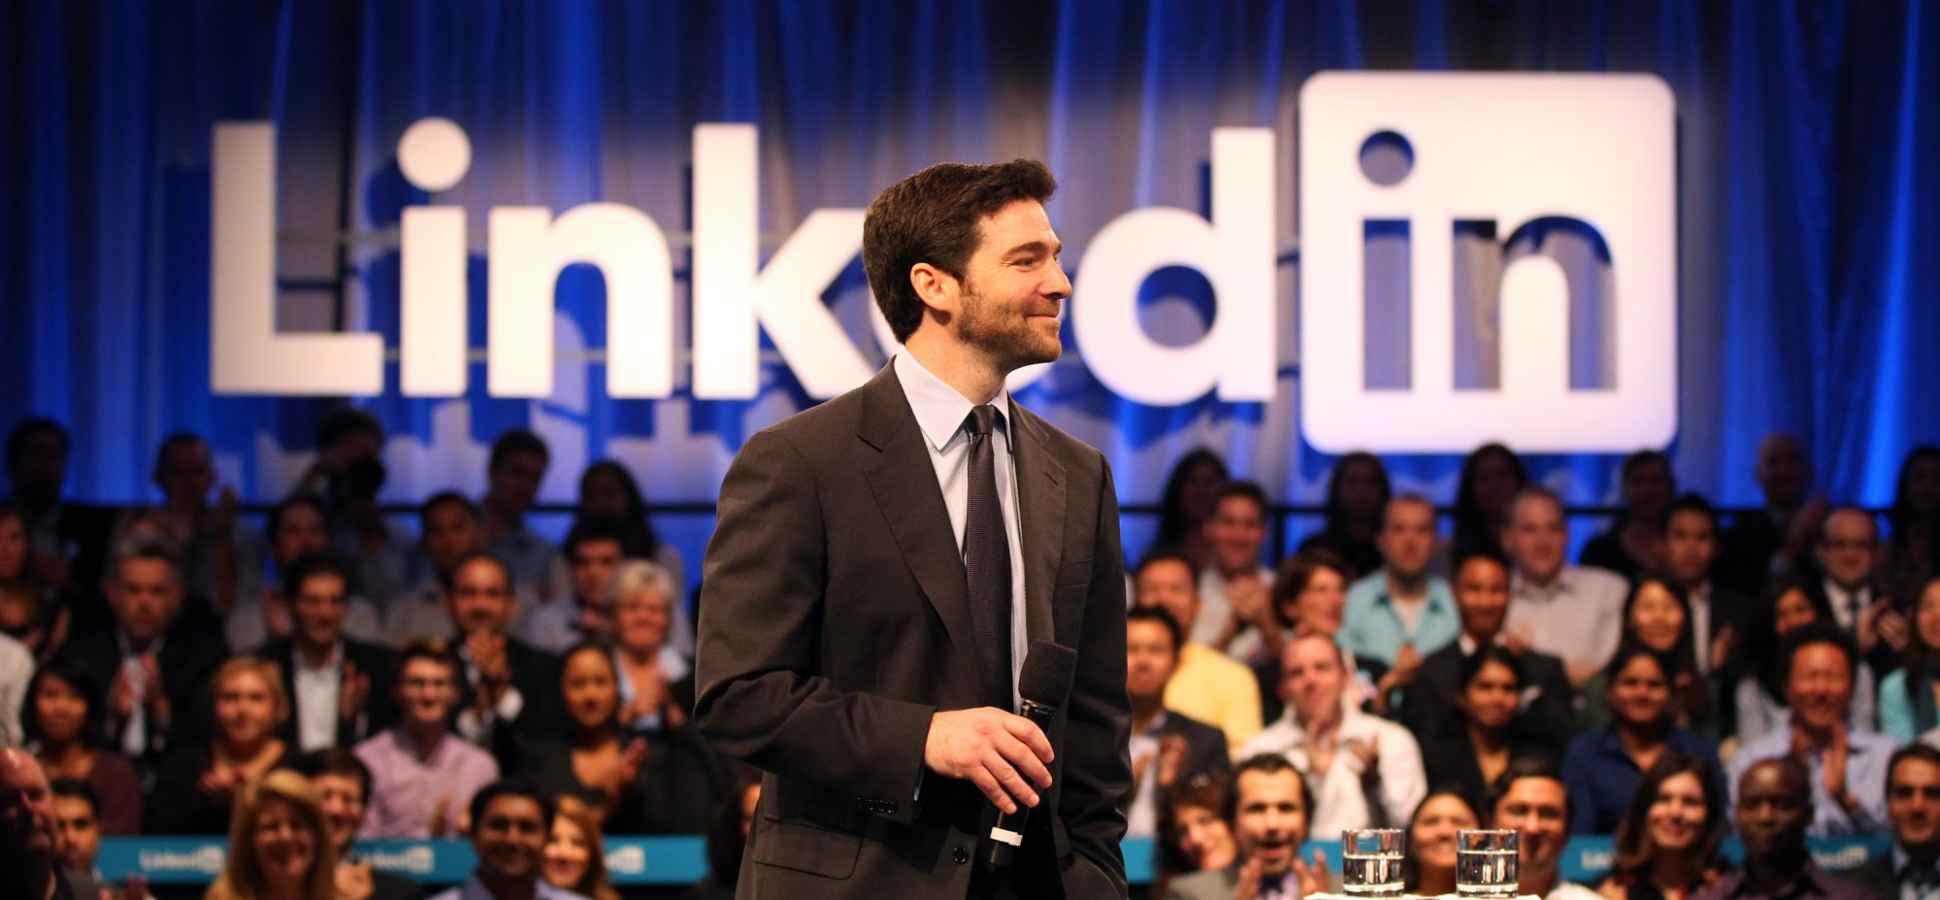 LinkedIn CEO Jeff Weiner's 3 Best Pieces of Career Advice